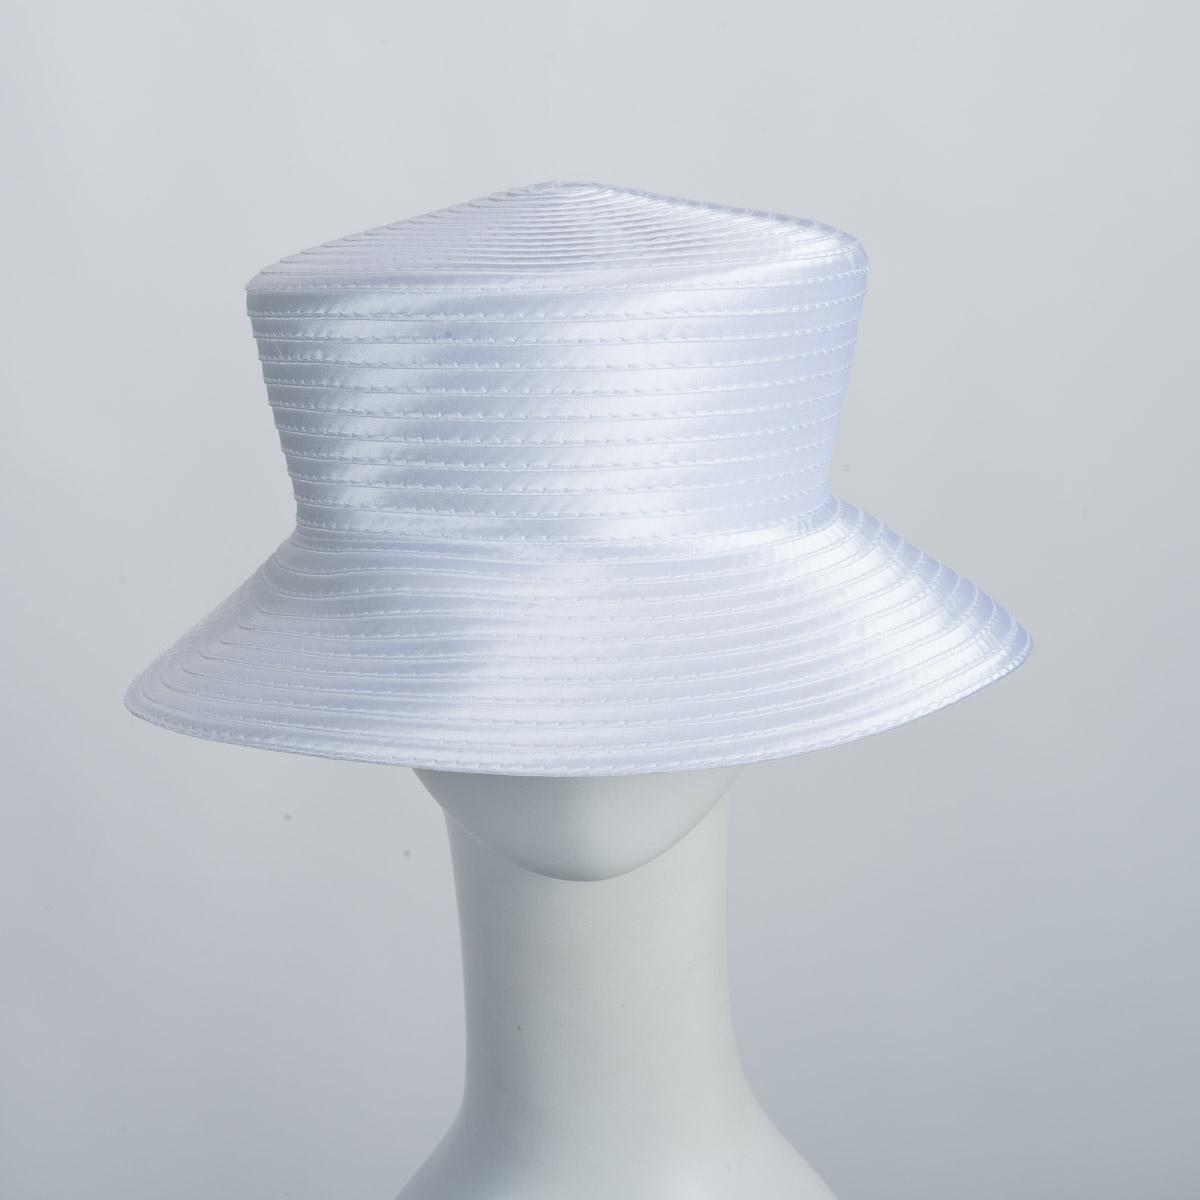 bc052fafcdc White Satin Braid Bucket Plain Hat Base Adjustable Sweatband-805109-WT- Sun  Yorkos